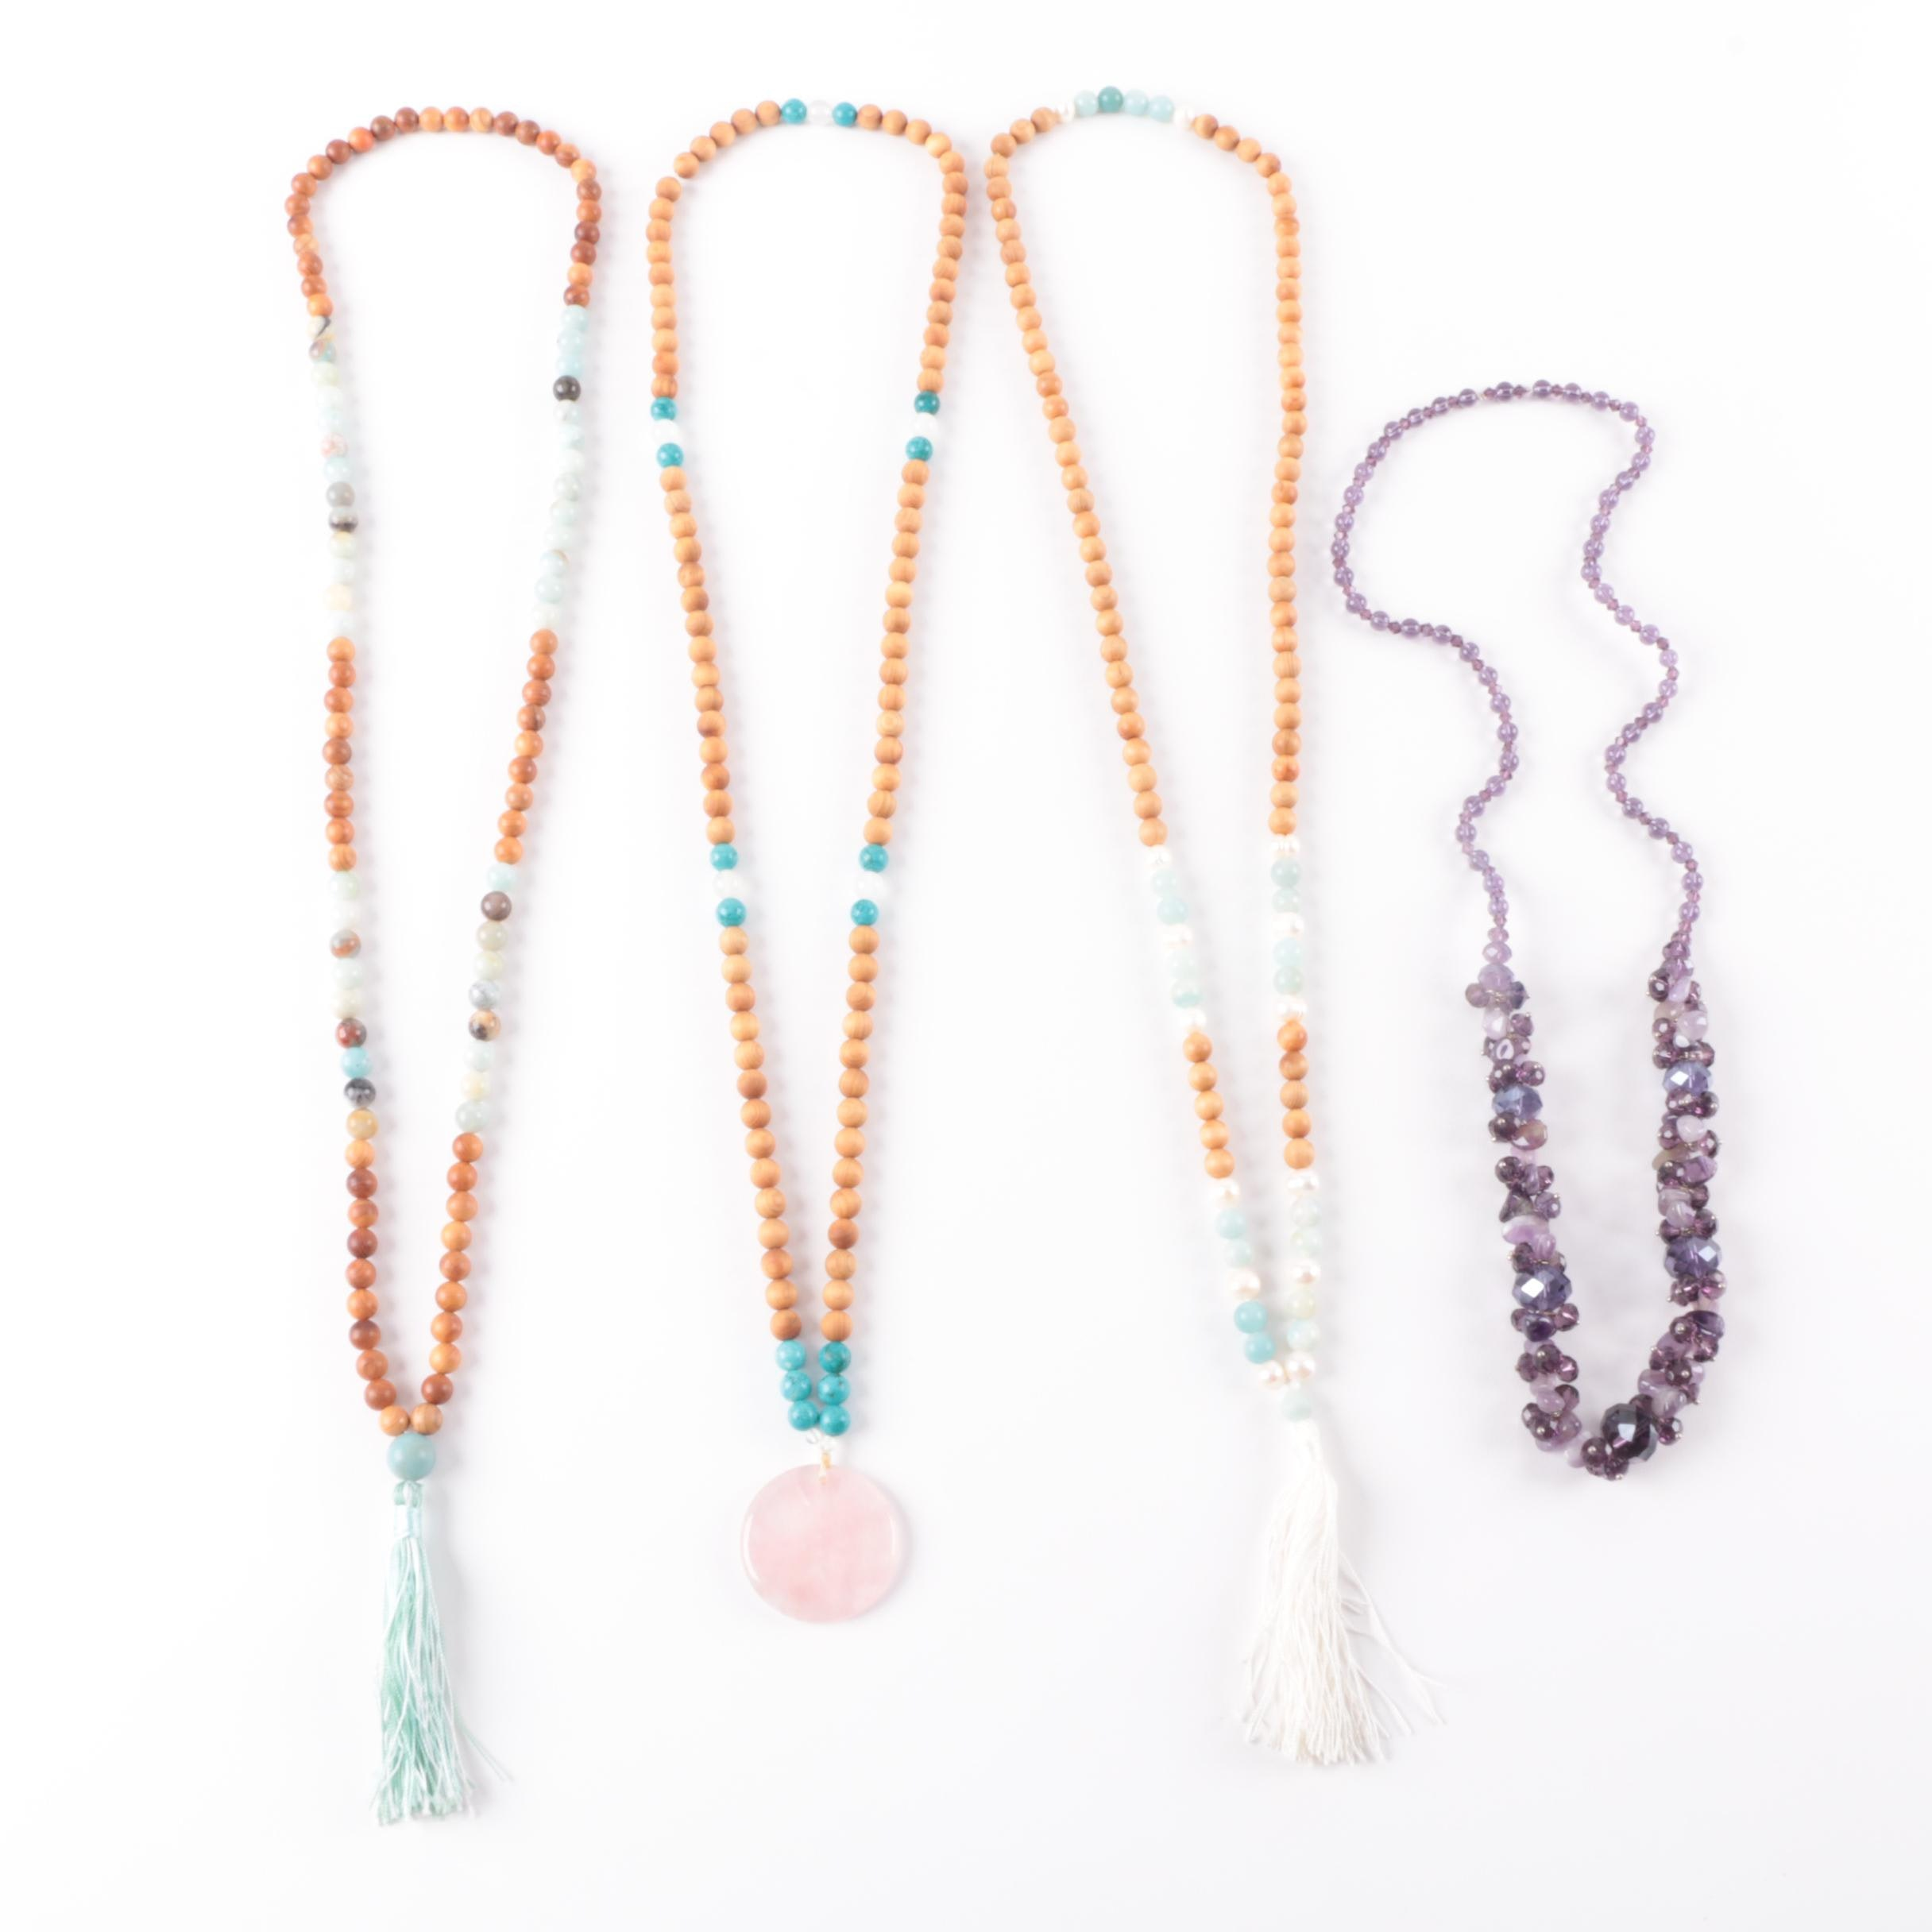 Selection of Beaded Necklaces Including Quartz and Aquamarine